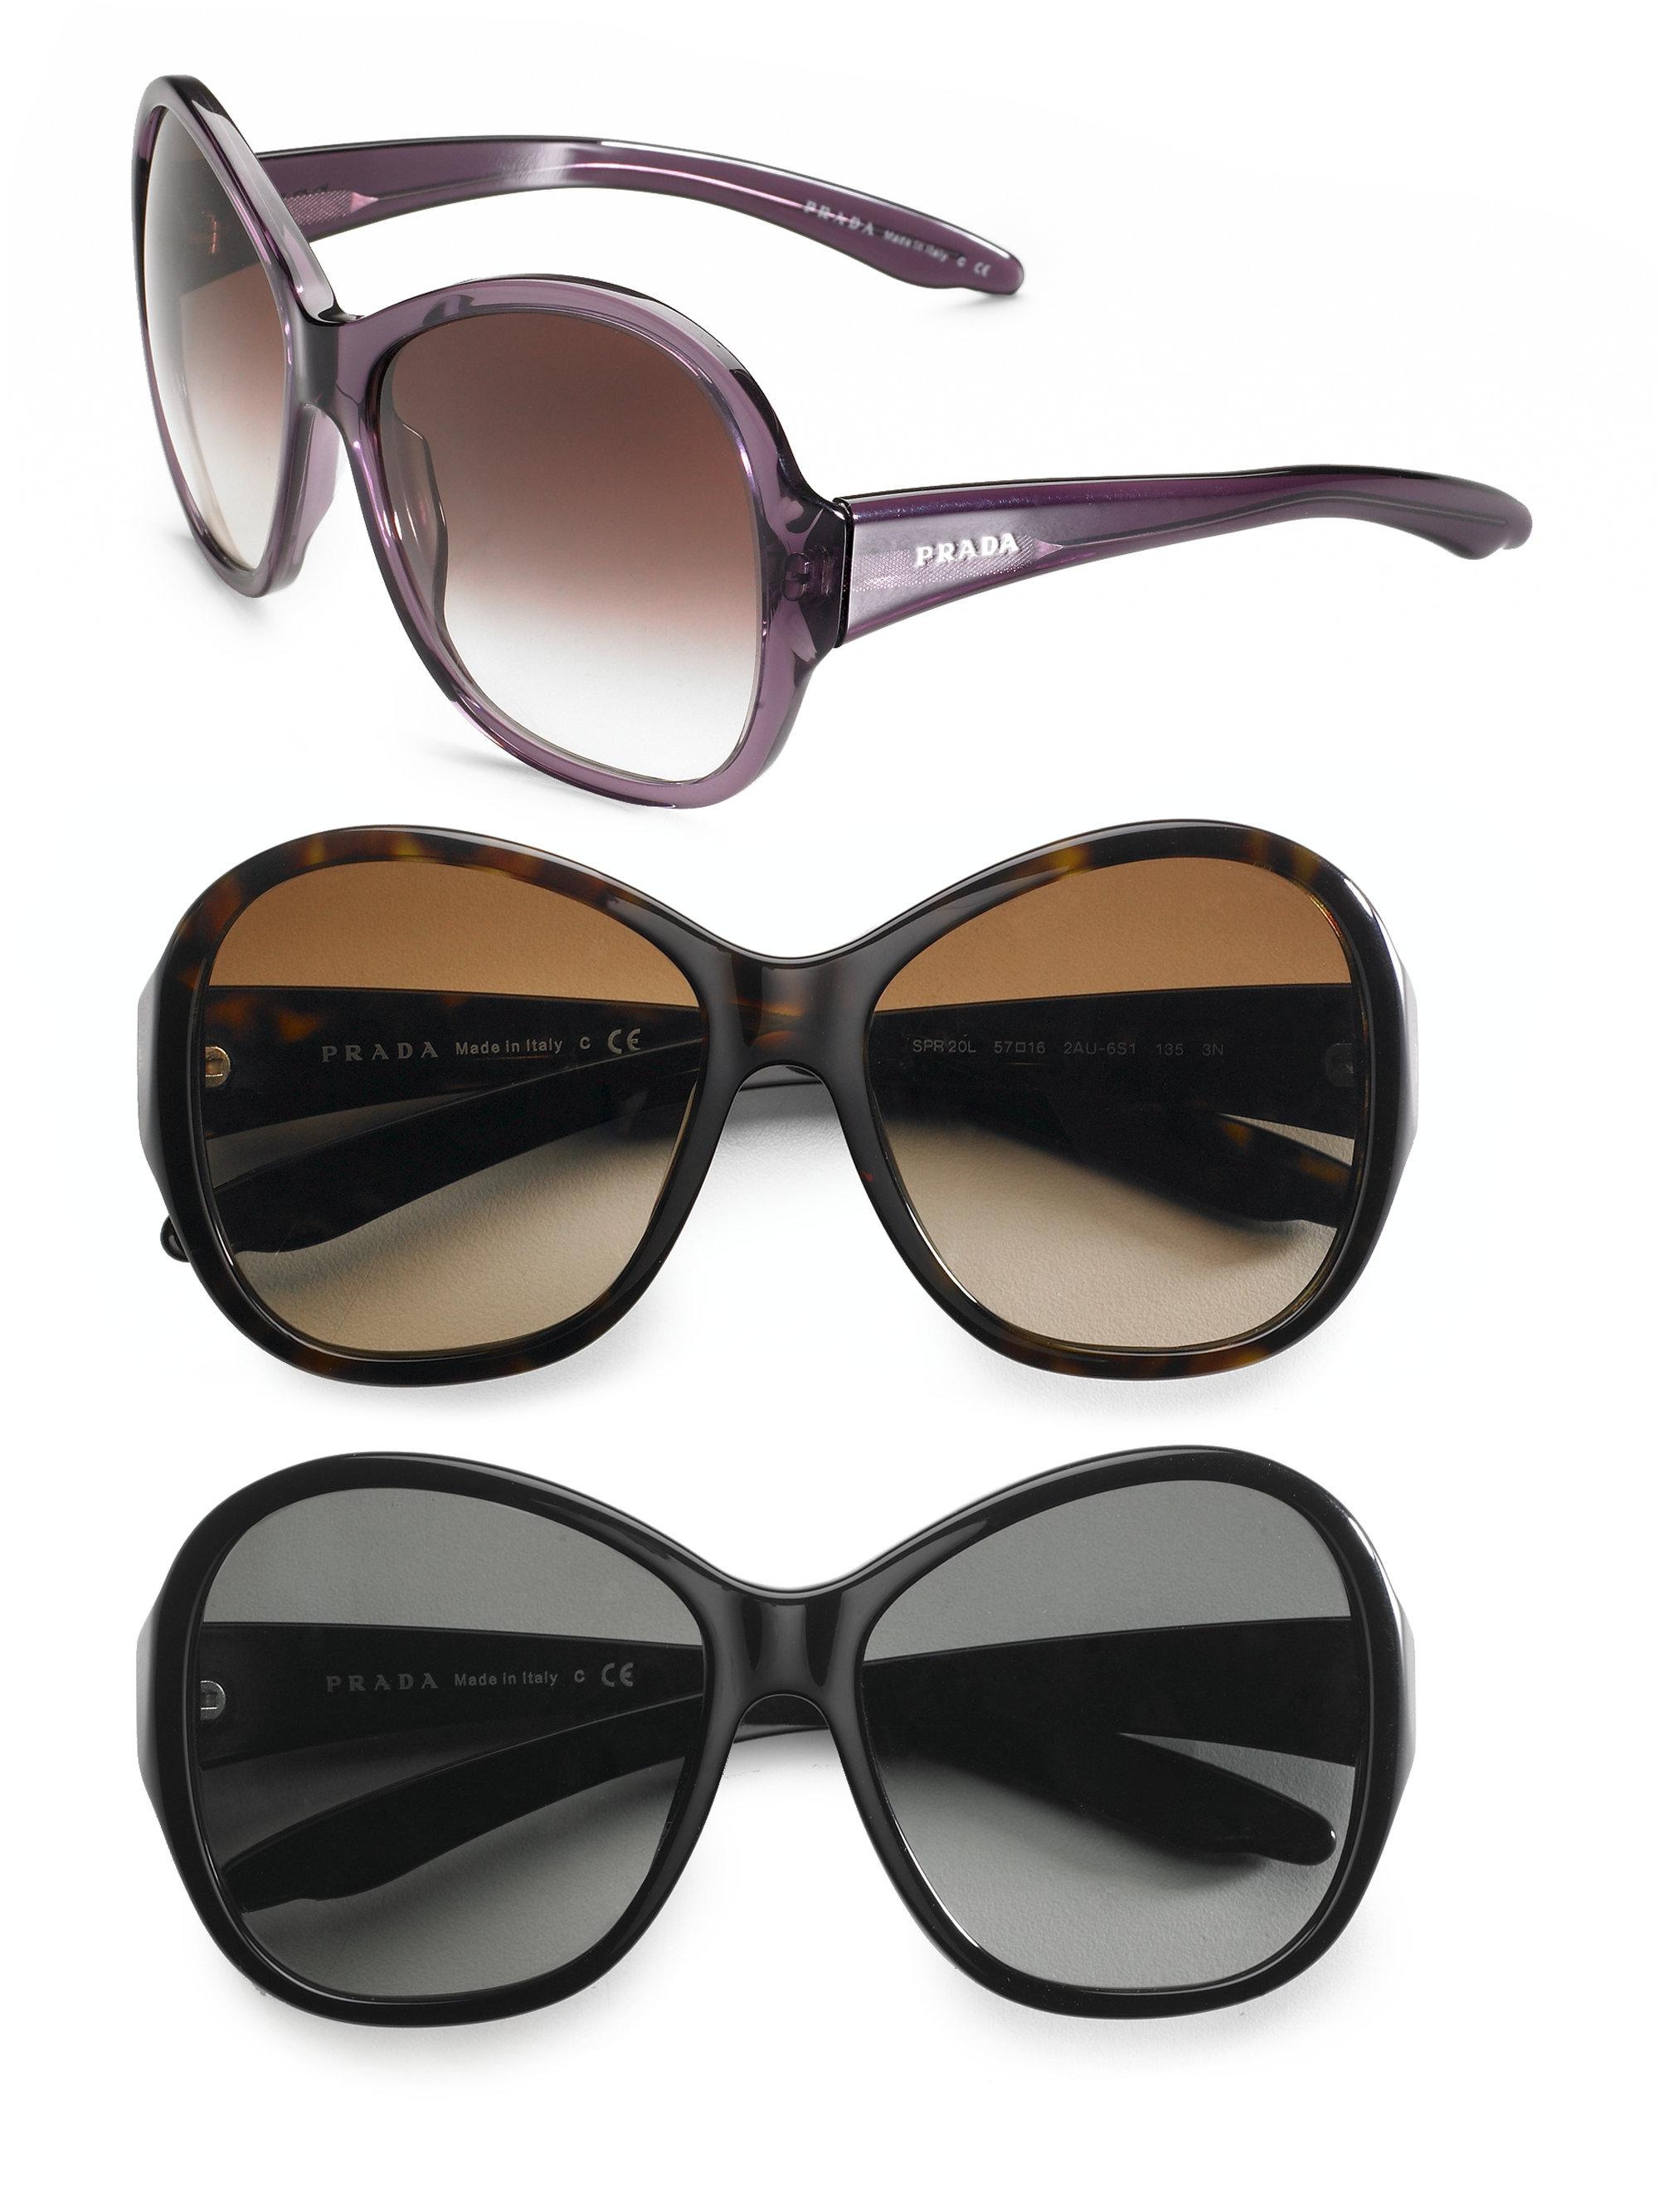 5da9dd40de59f Prada Womens Large Sunglasses Black